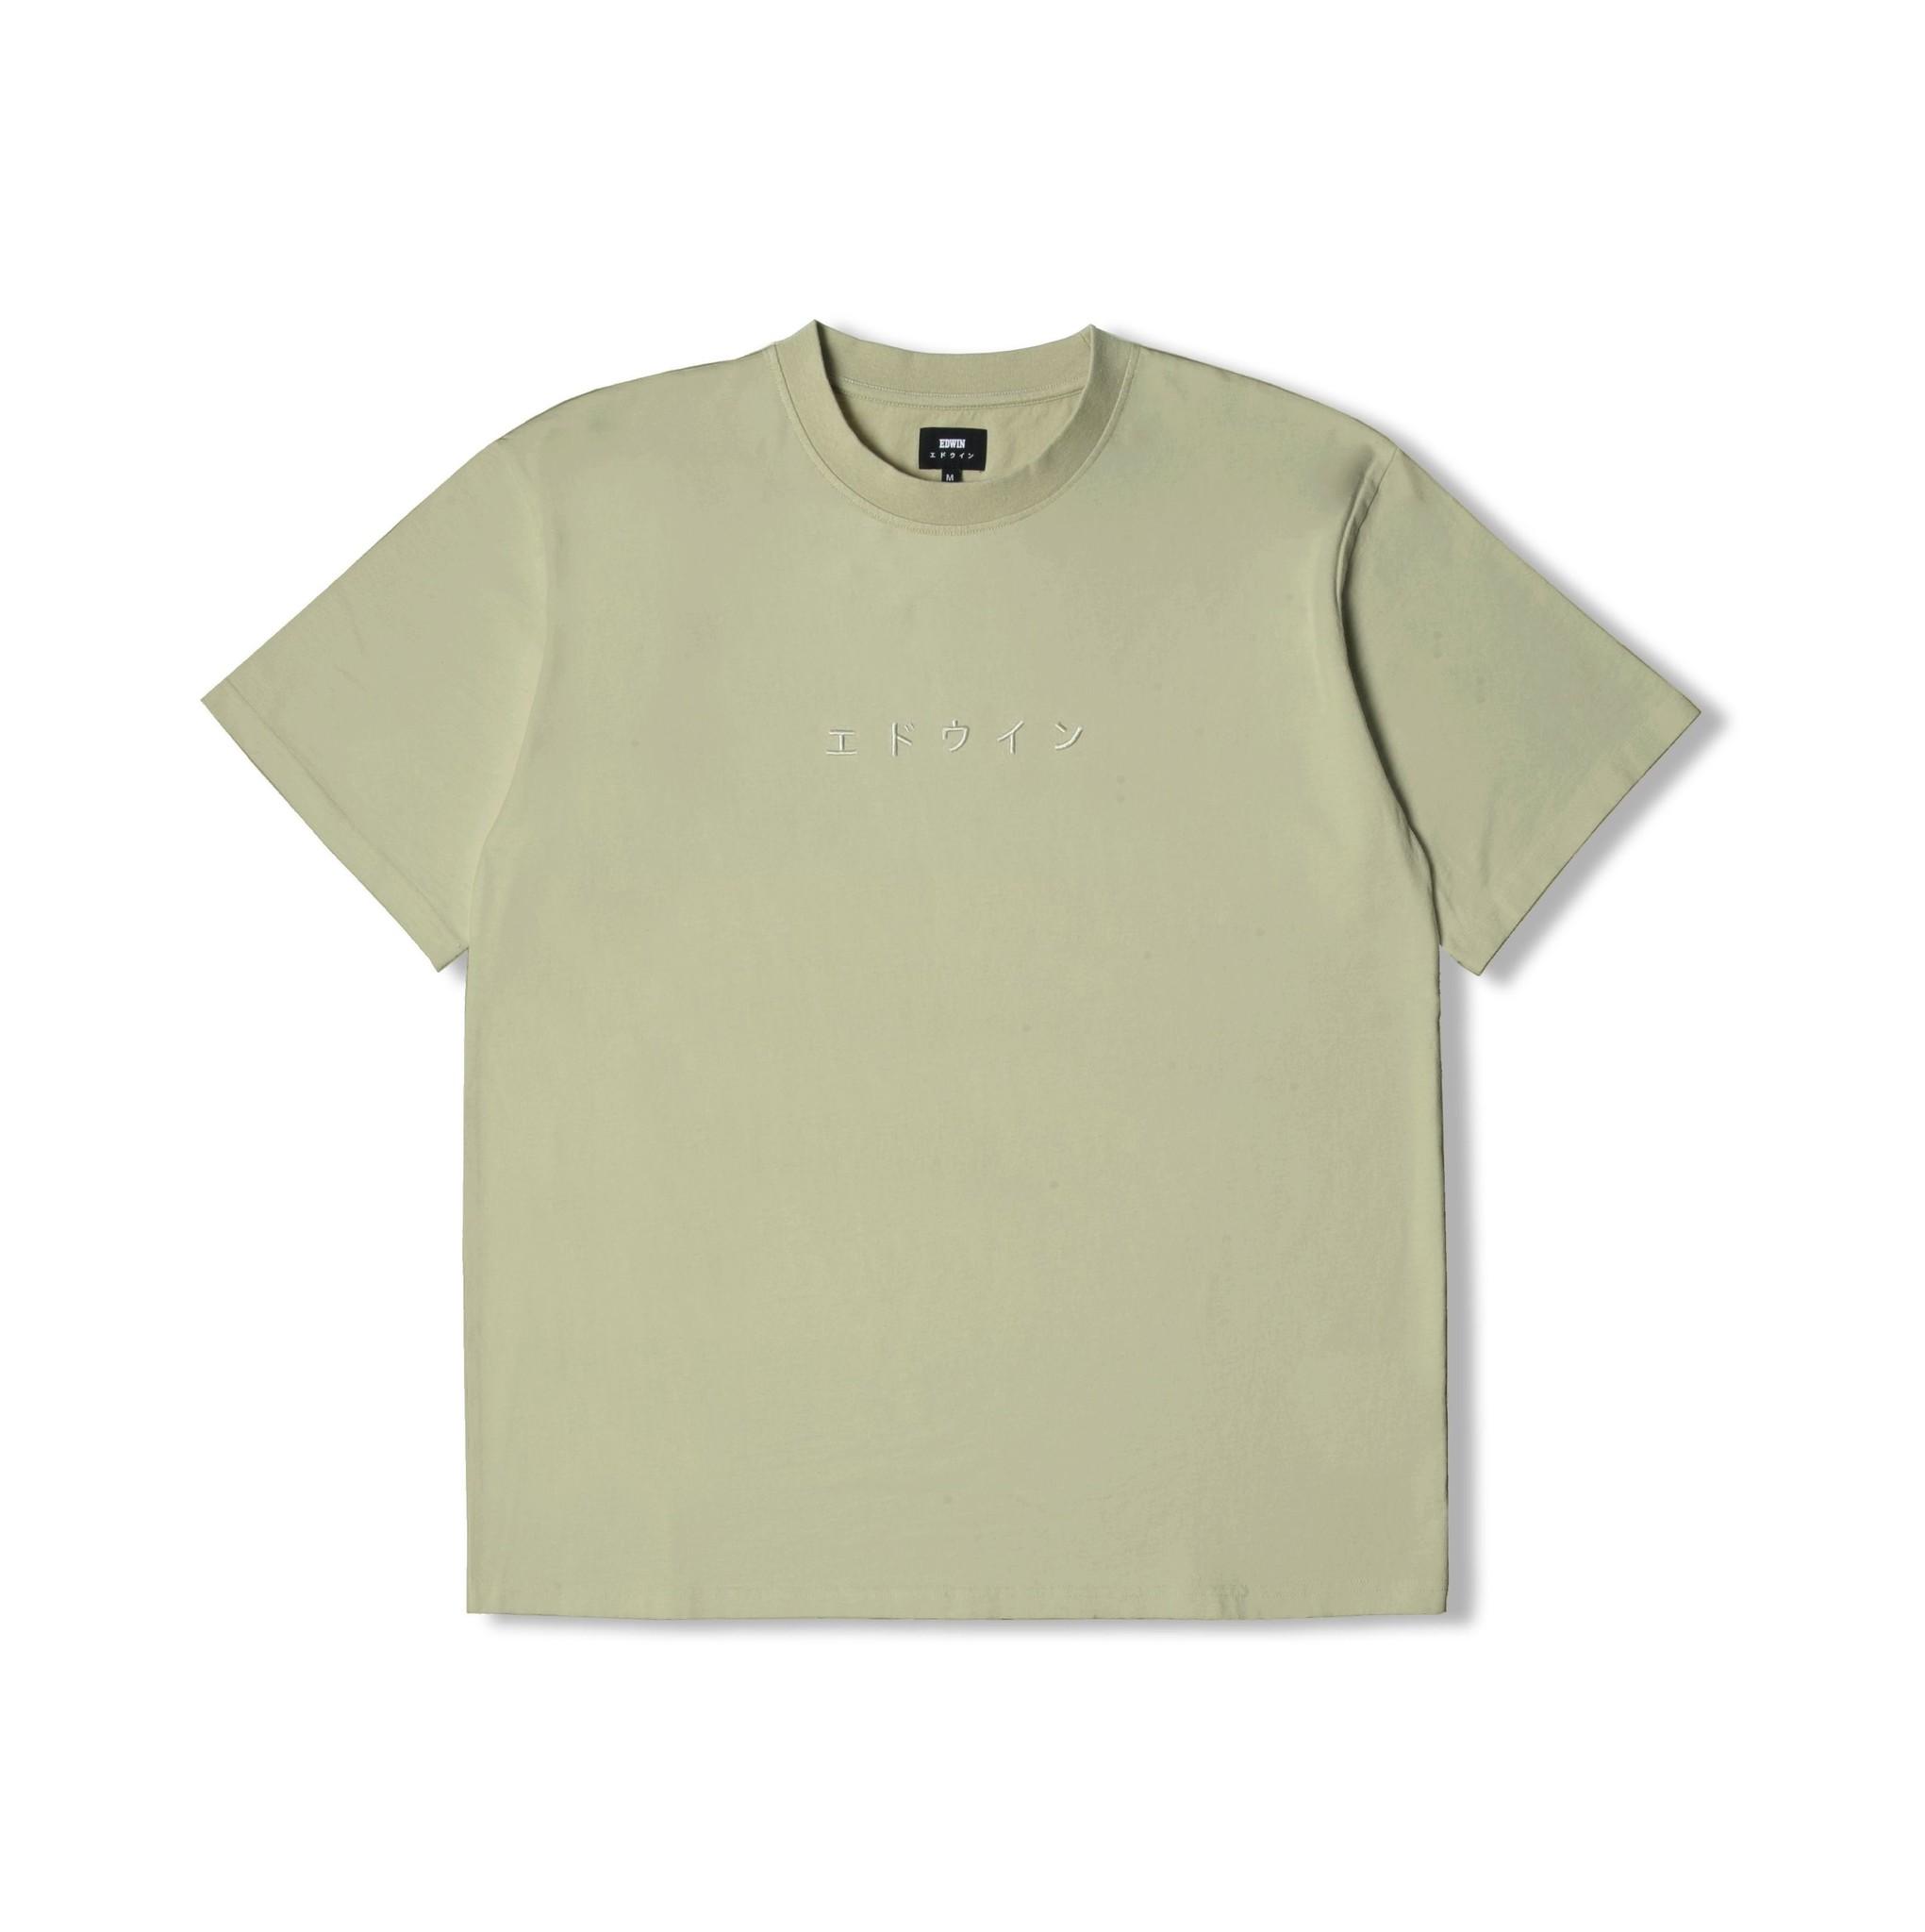 Katakana Embroidery T-Shirt Green-1